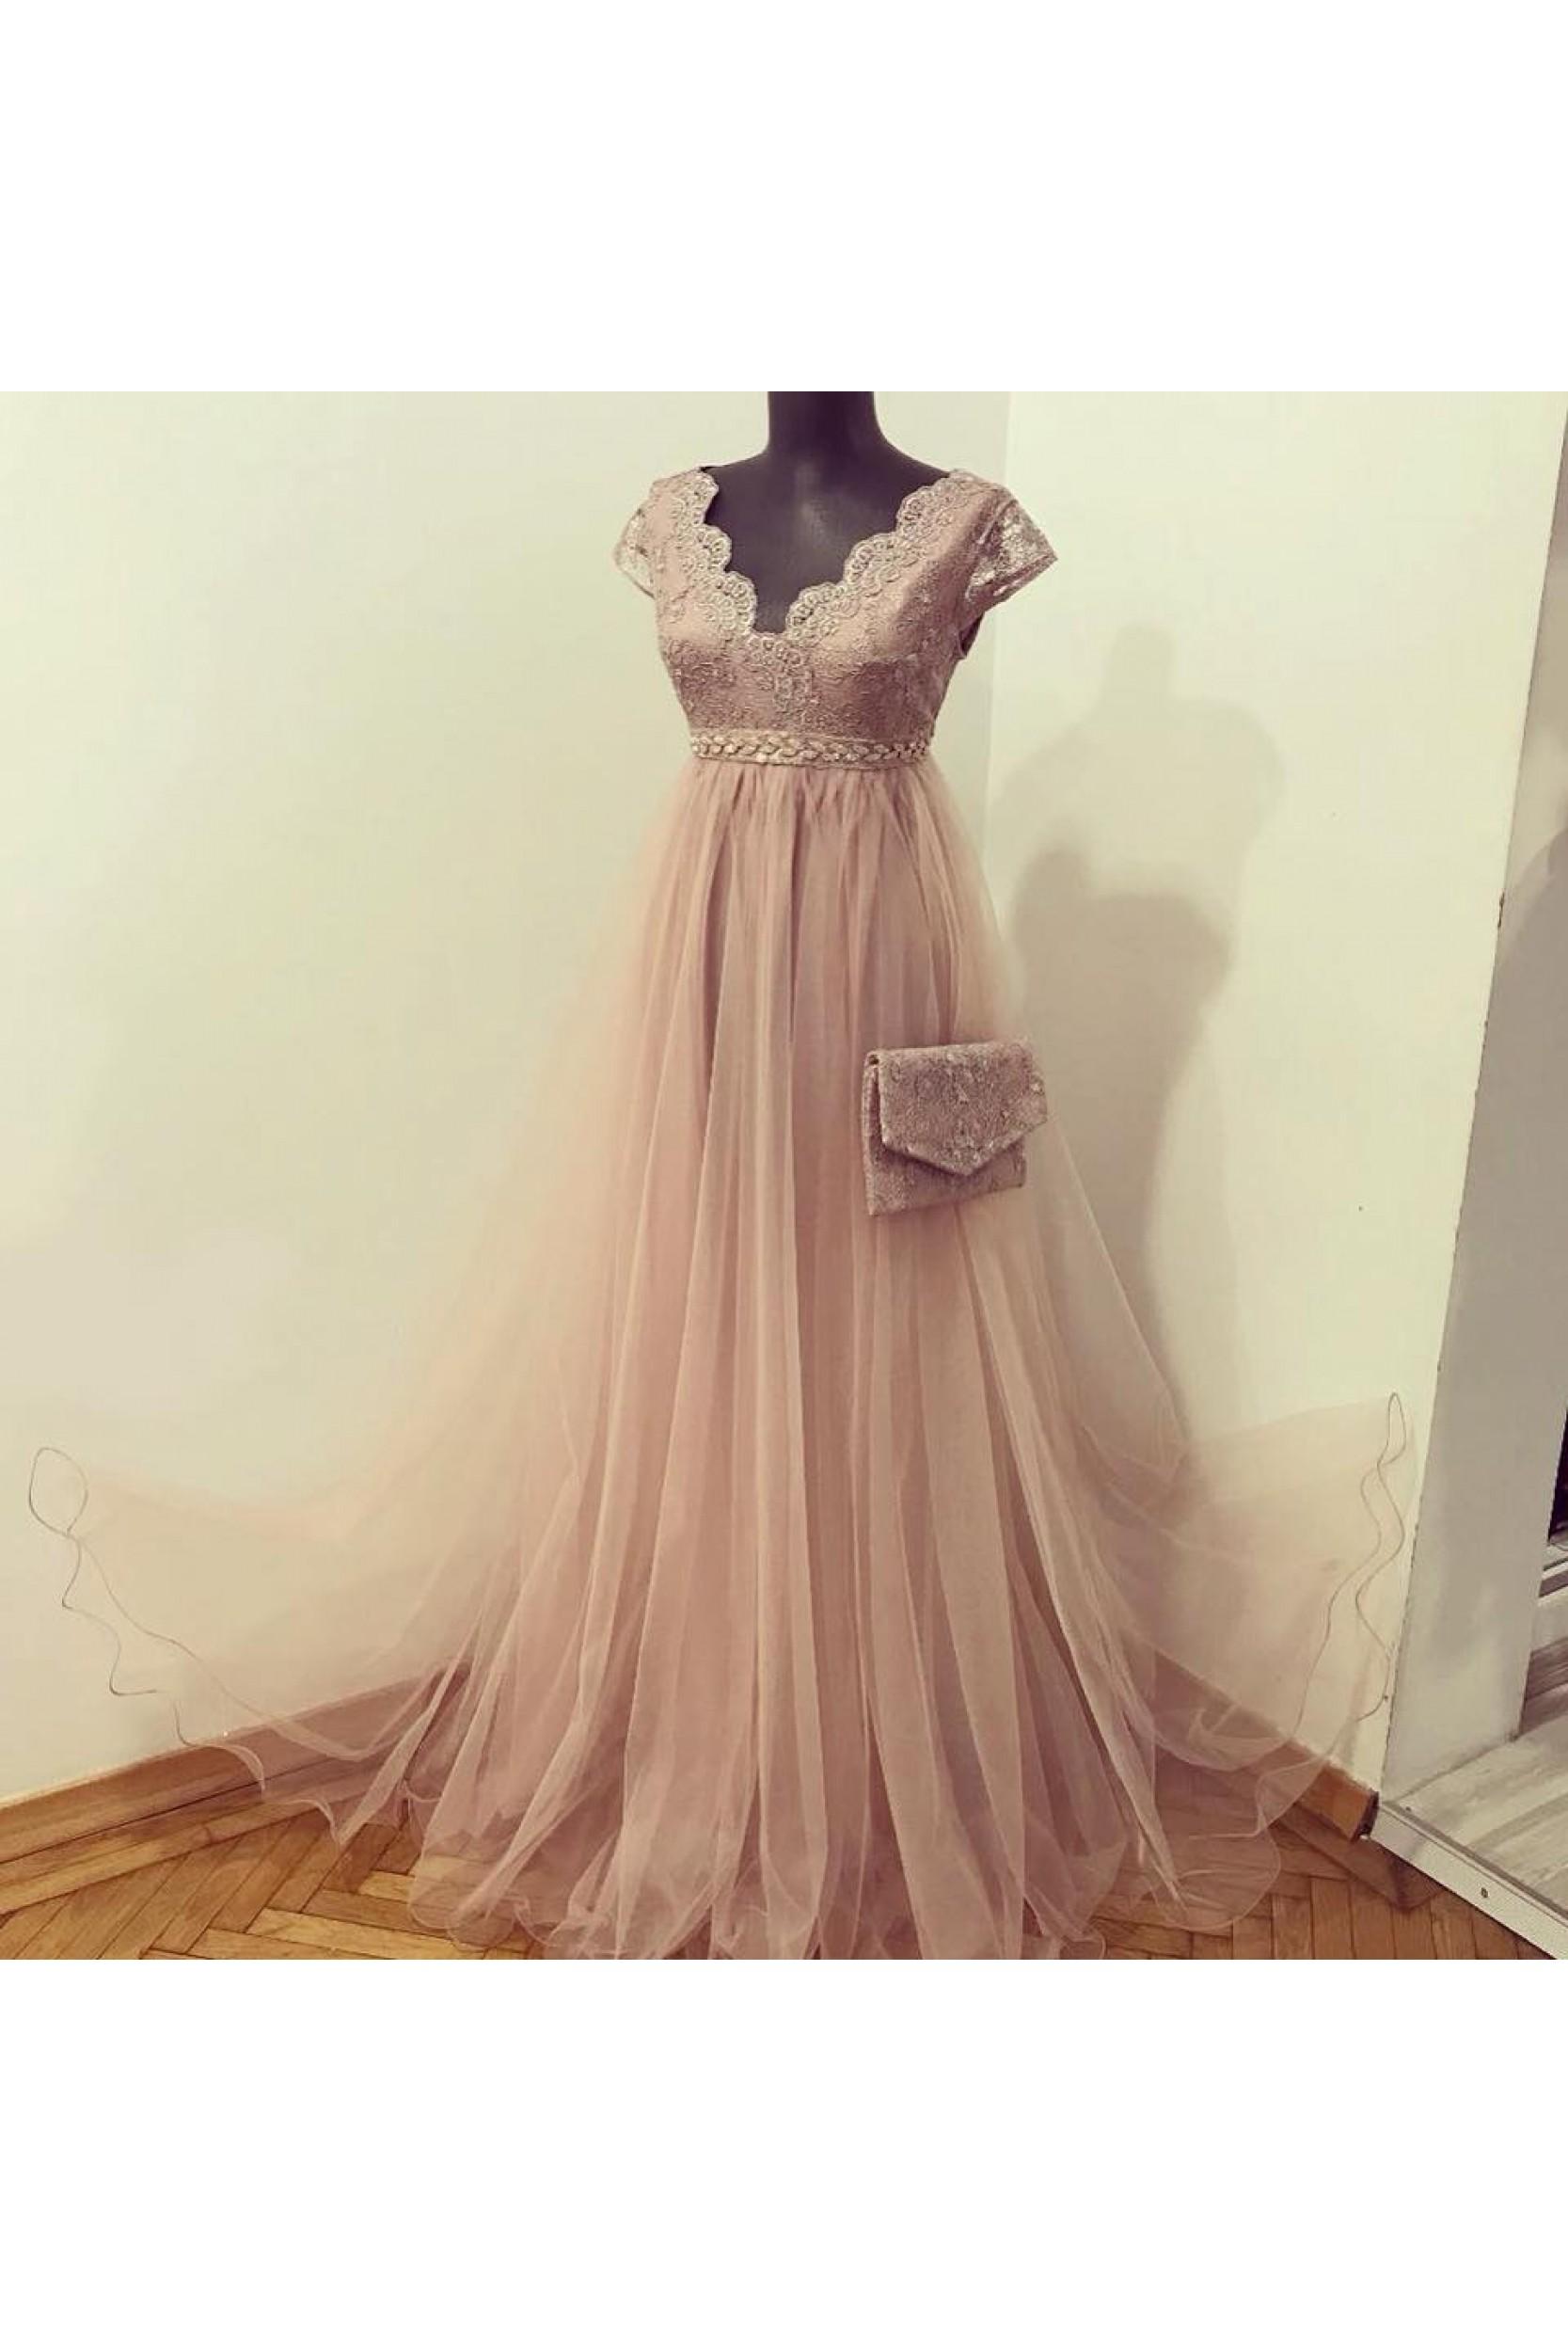 Rochie  realizata din broderie argintie, tulle fin rose pudrat si cristale rose